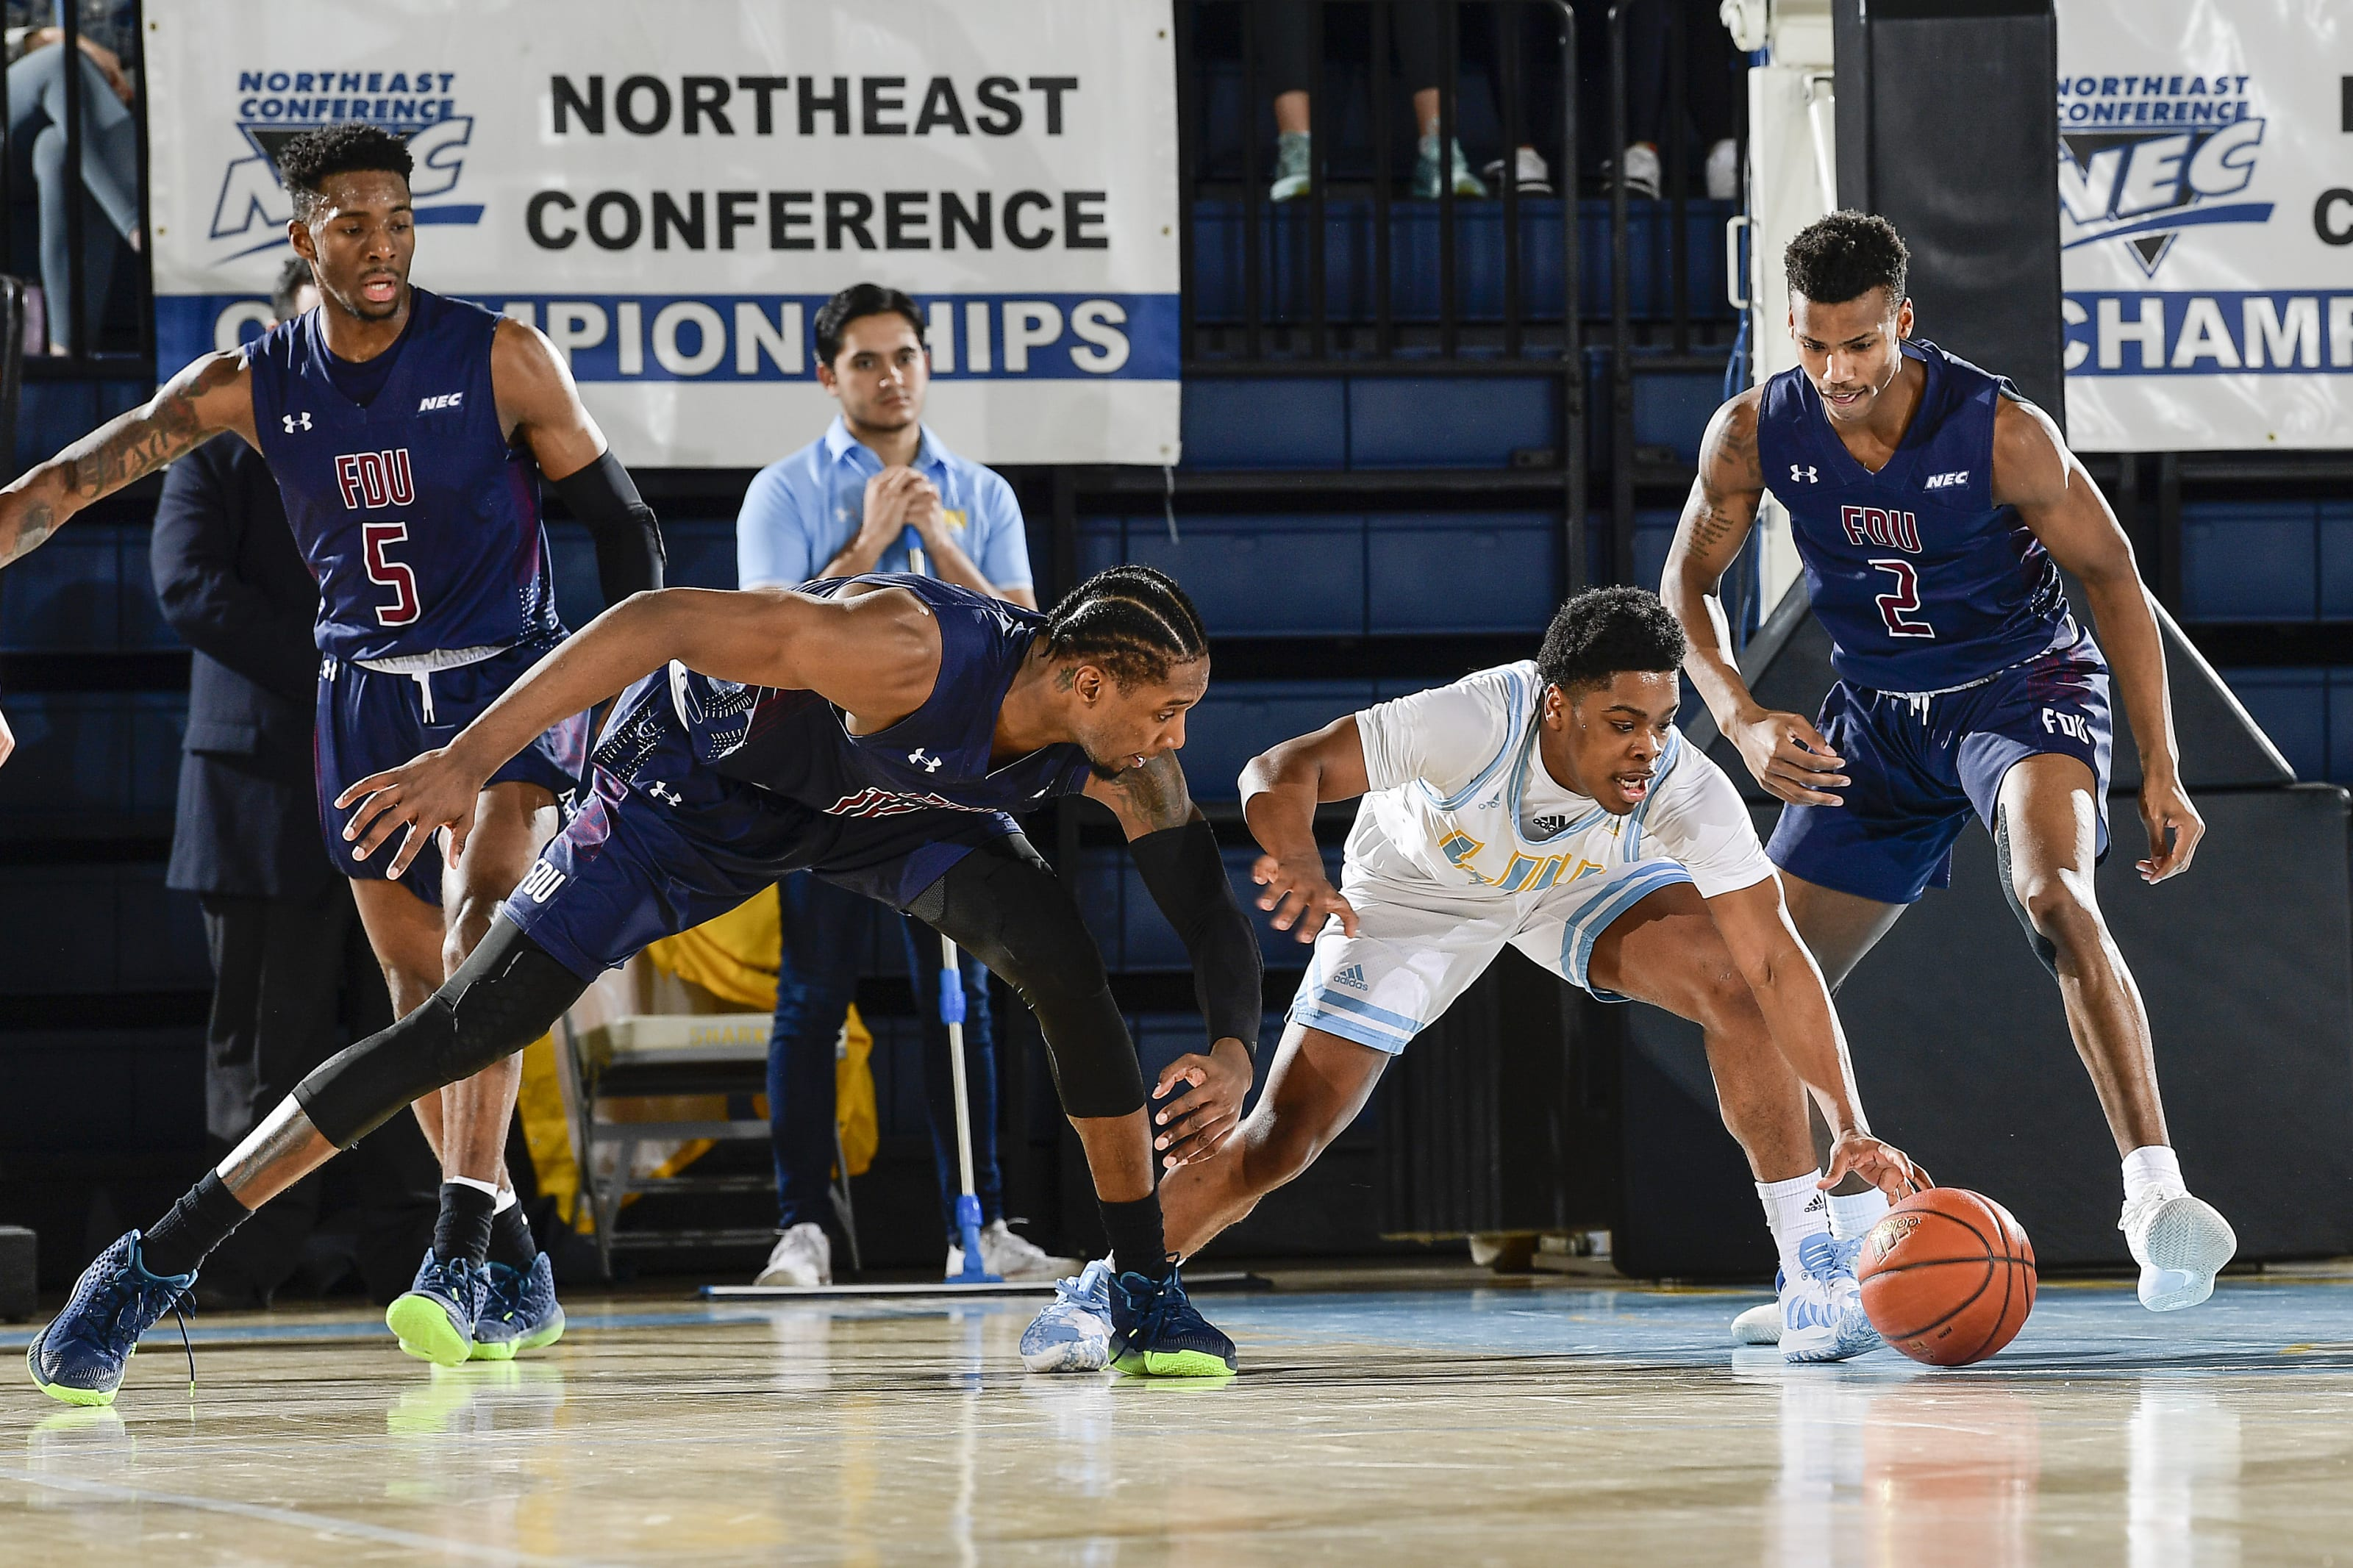 NEC Basketball